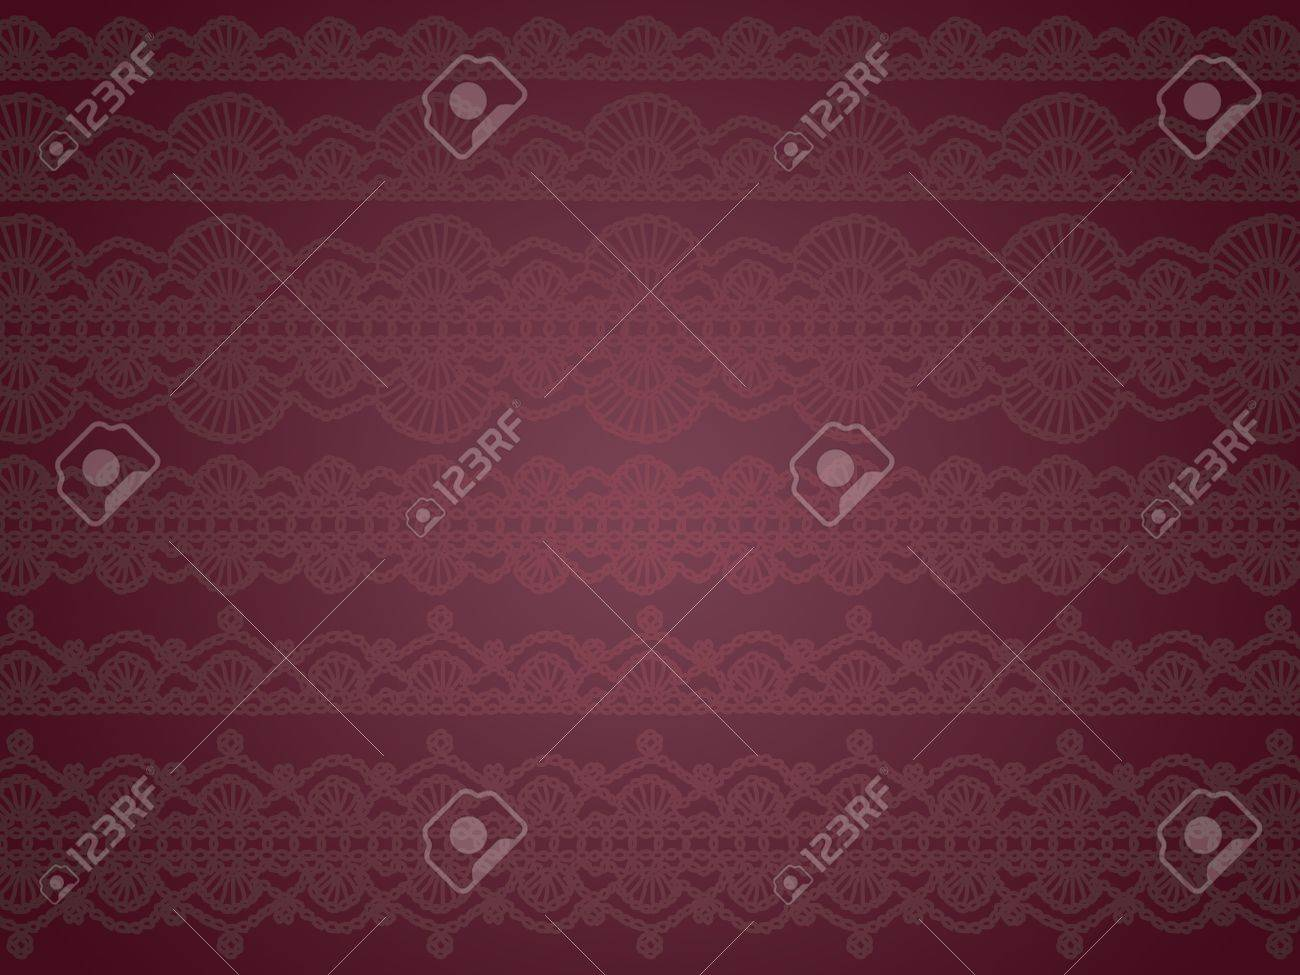 Dark Purple Elegant Background Or Wallpaper With Vintage Patterns Stock Photo